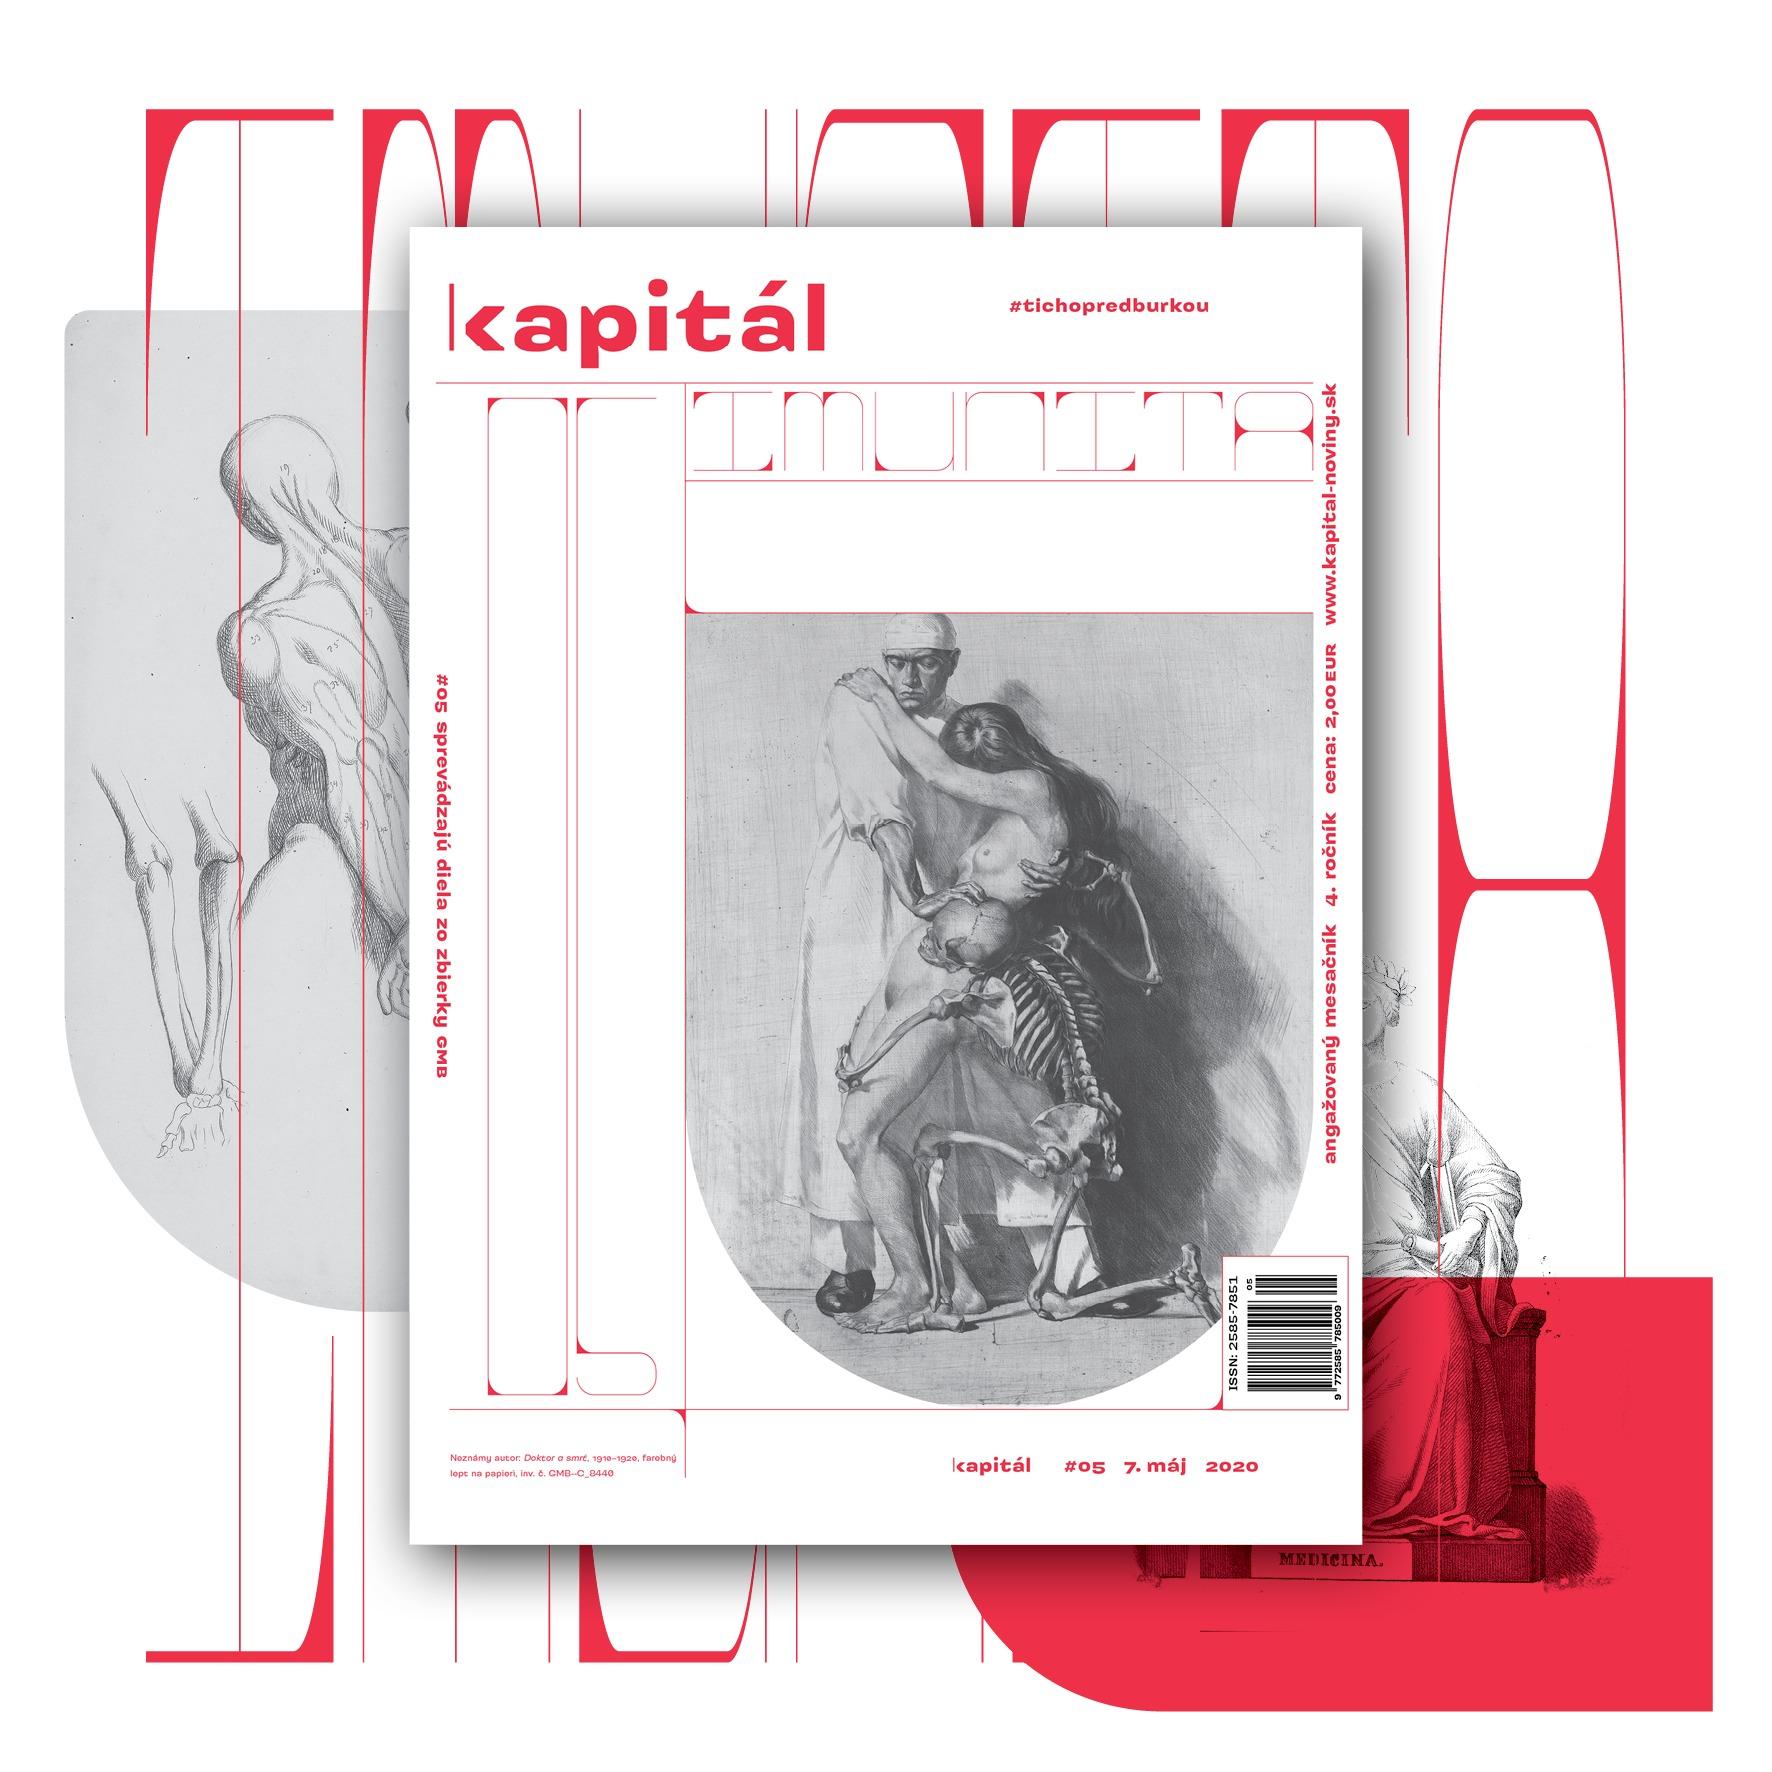 https://kapital-noviny.sk/wp-content/uploads/2020/05/KAPITAL-WEB_PROFILOVKY-CISIEL_2020_05_IMUNITA.jpg